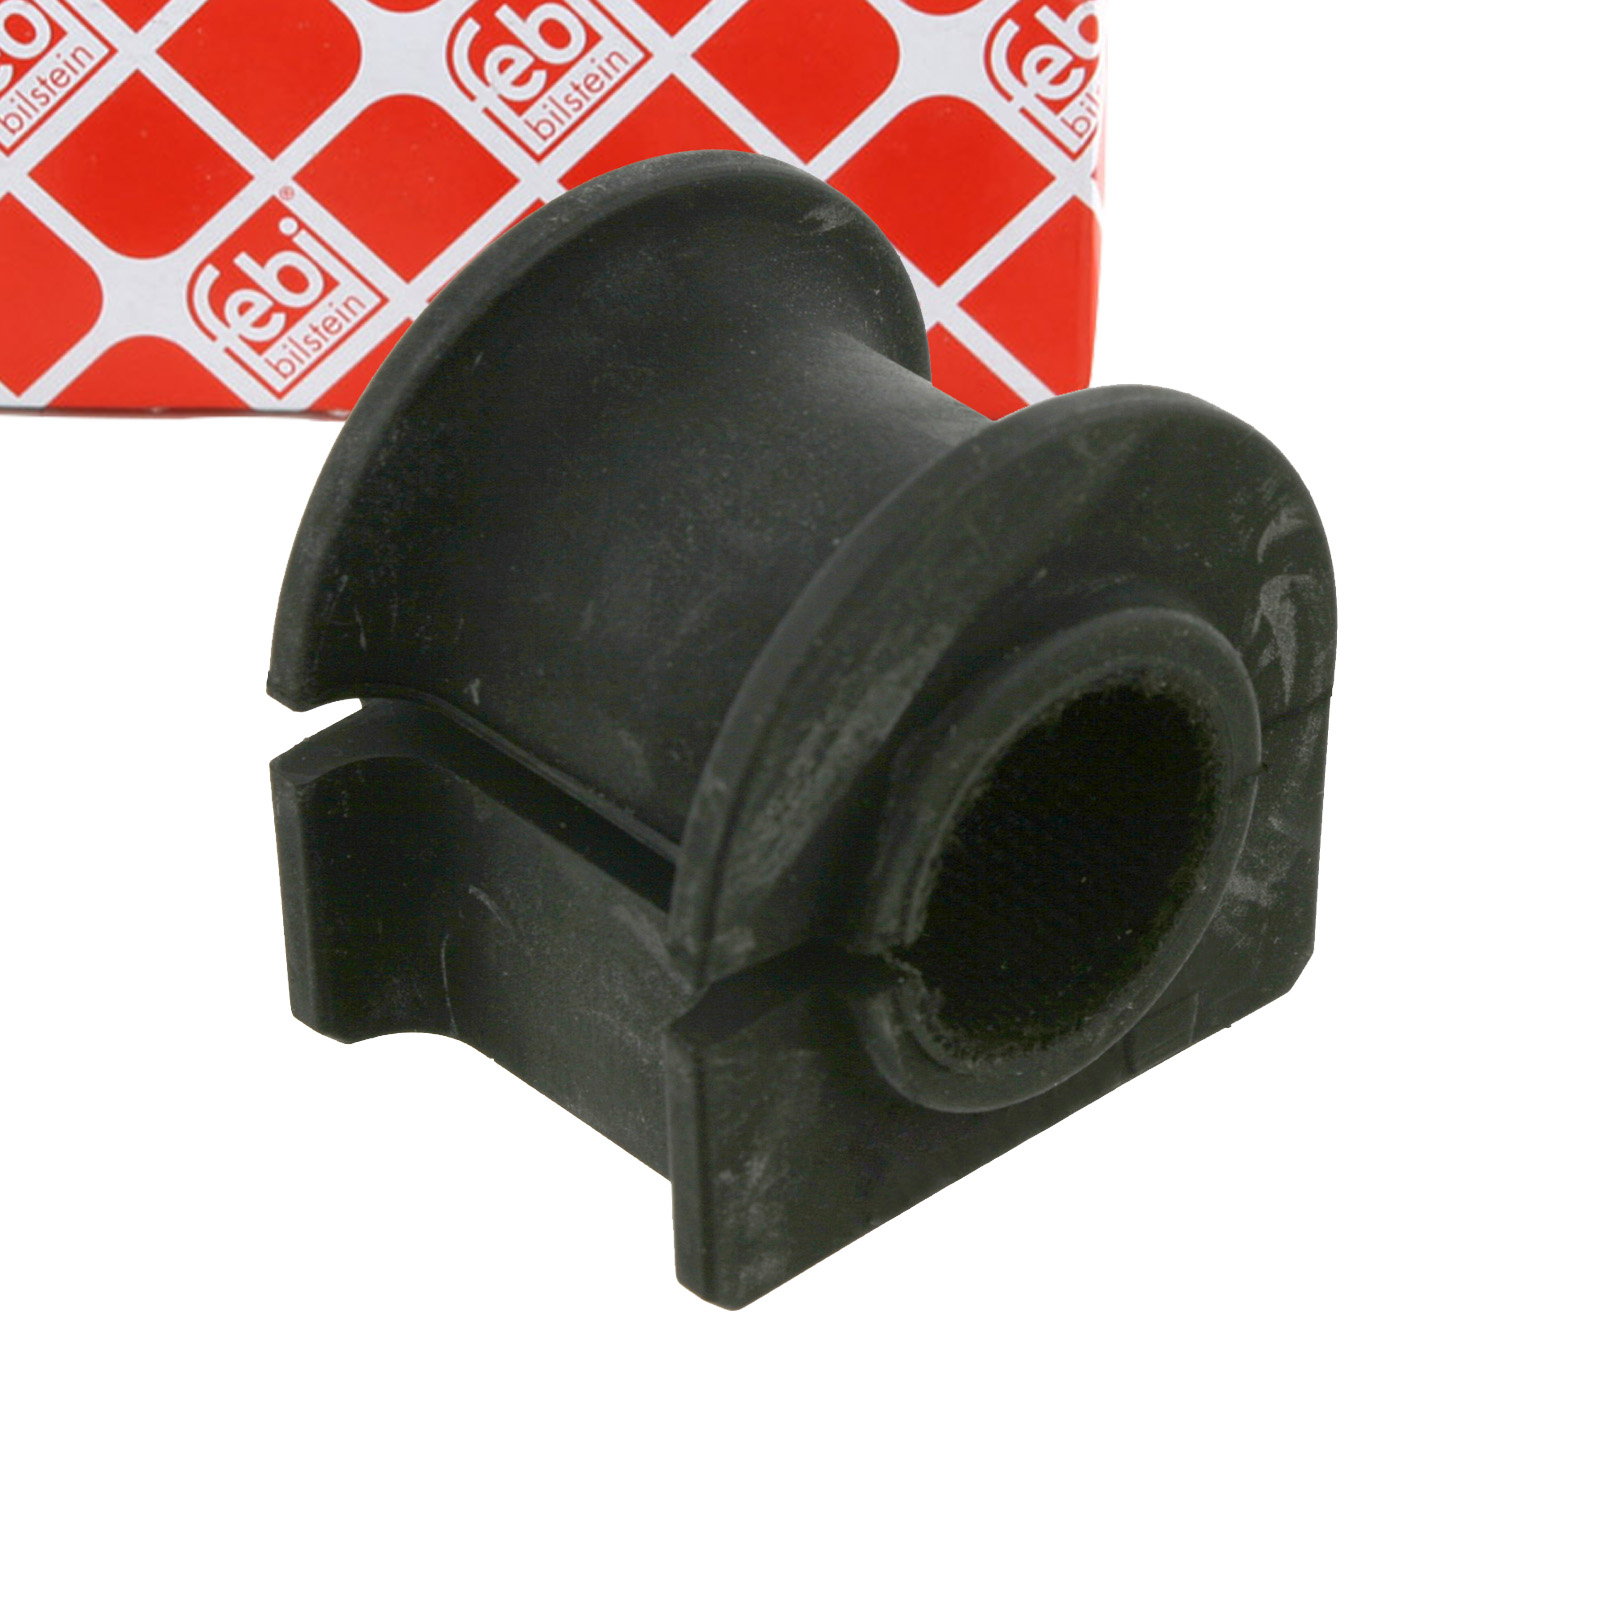 2x FEBI 24220 Stabilisatorlager FORD Mondeo 3 MK3 Stufenheck hinten